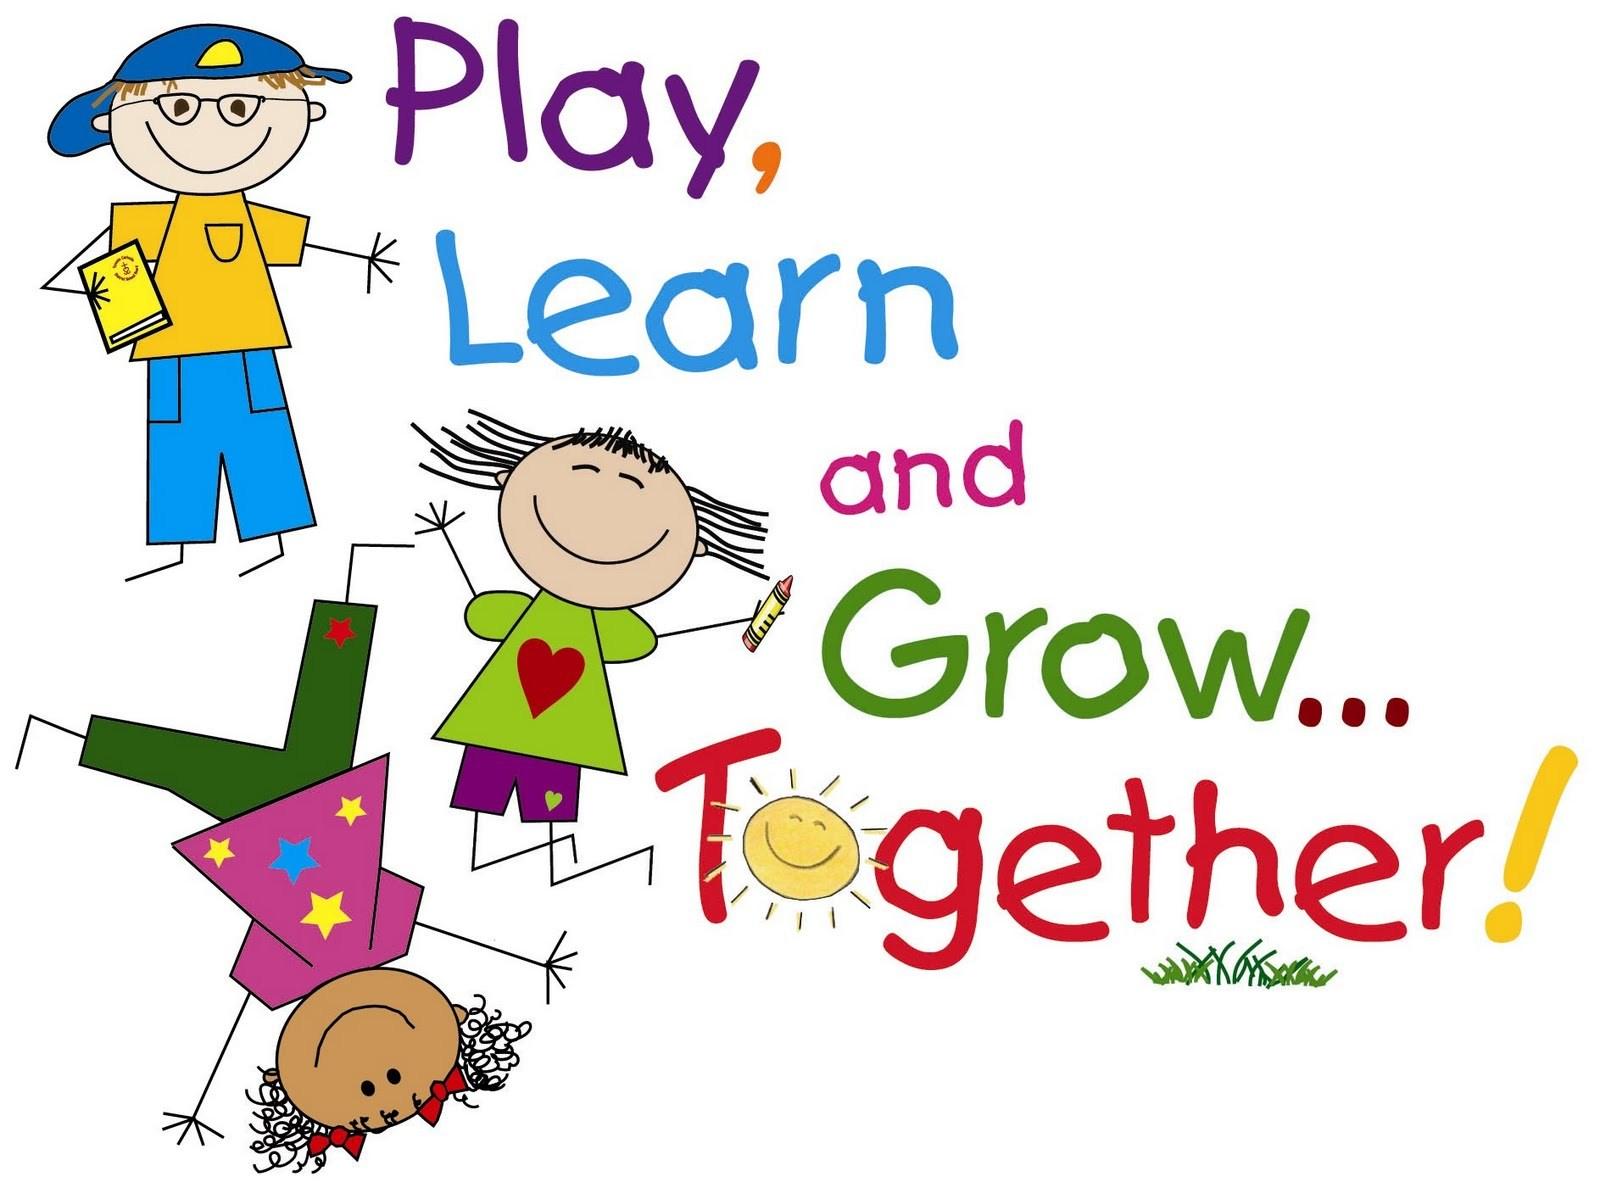 Free preschool clipart for teachers 4 » Clipart Portal.